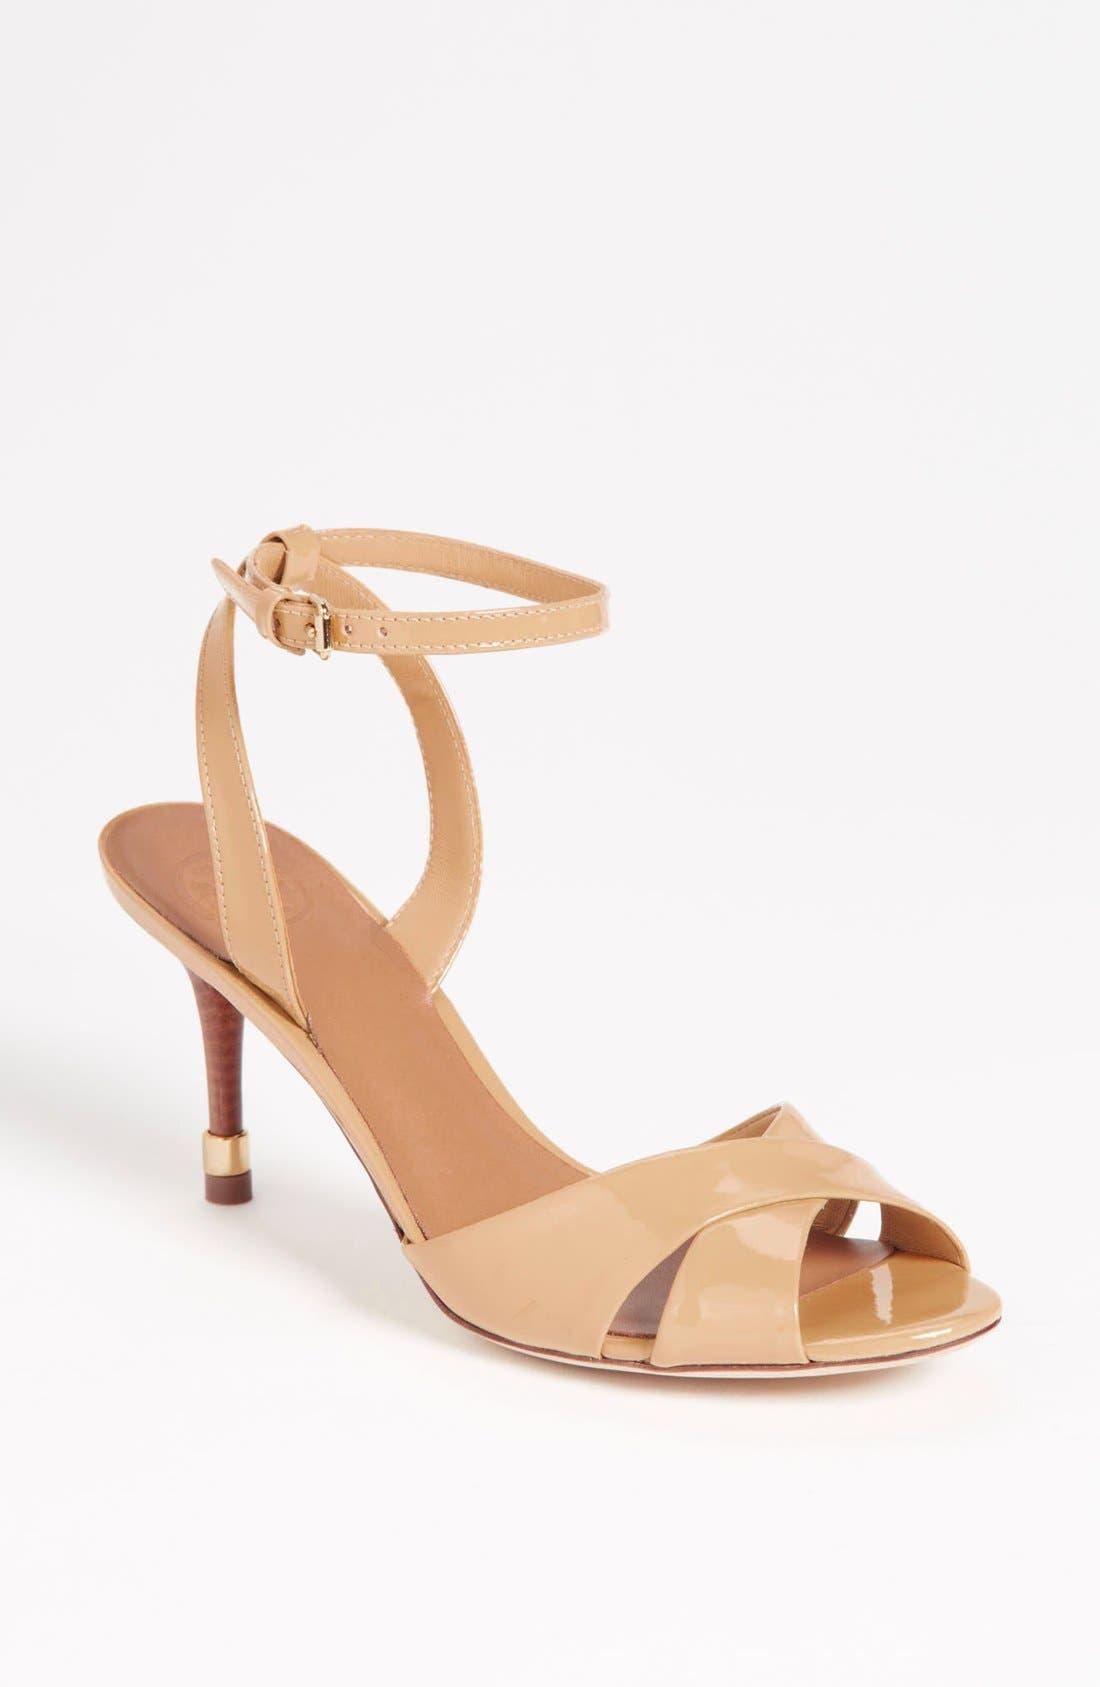 Main Image - Tory Burch 'Tania' Sandal